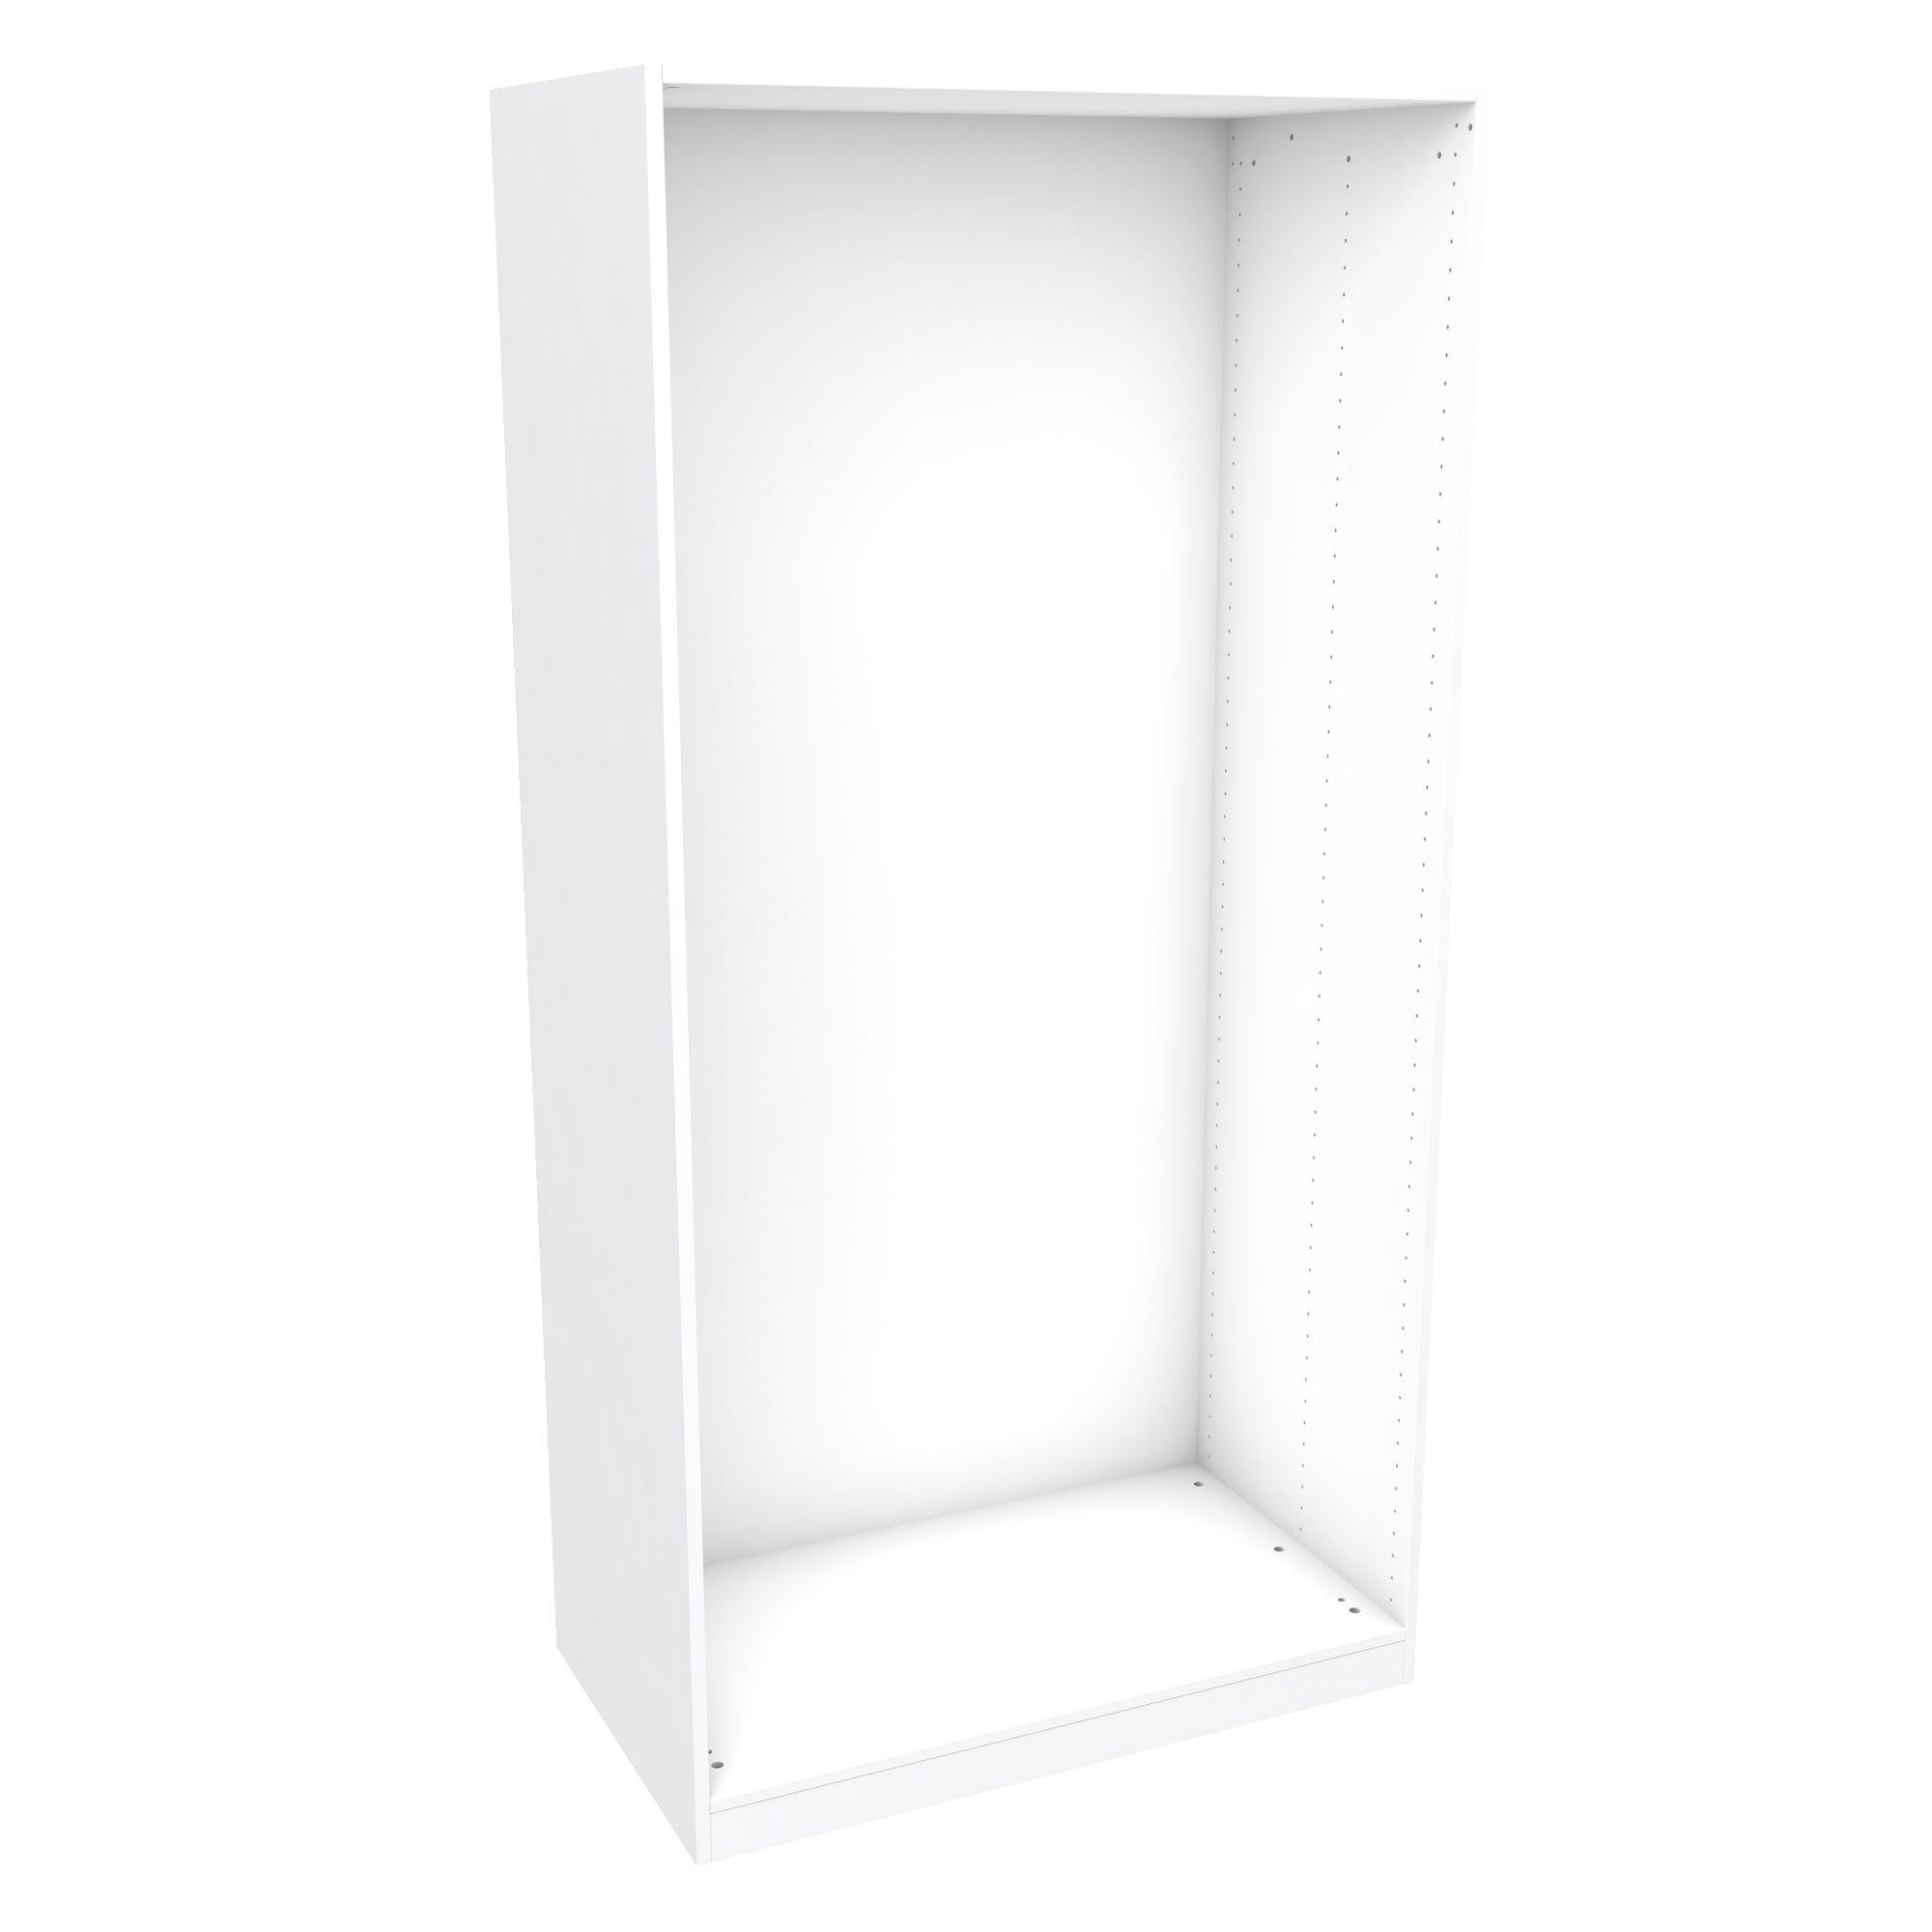 Darwin Modular White Wardrobe Cabinet (h)2004mm (w)1000mm (d)566mm